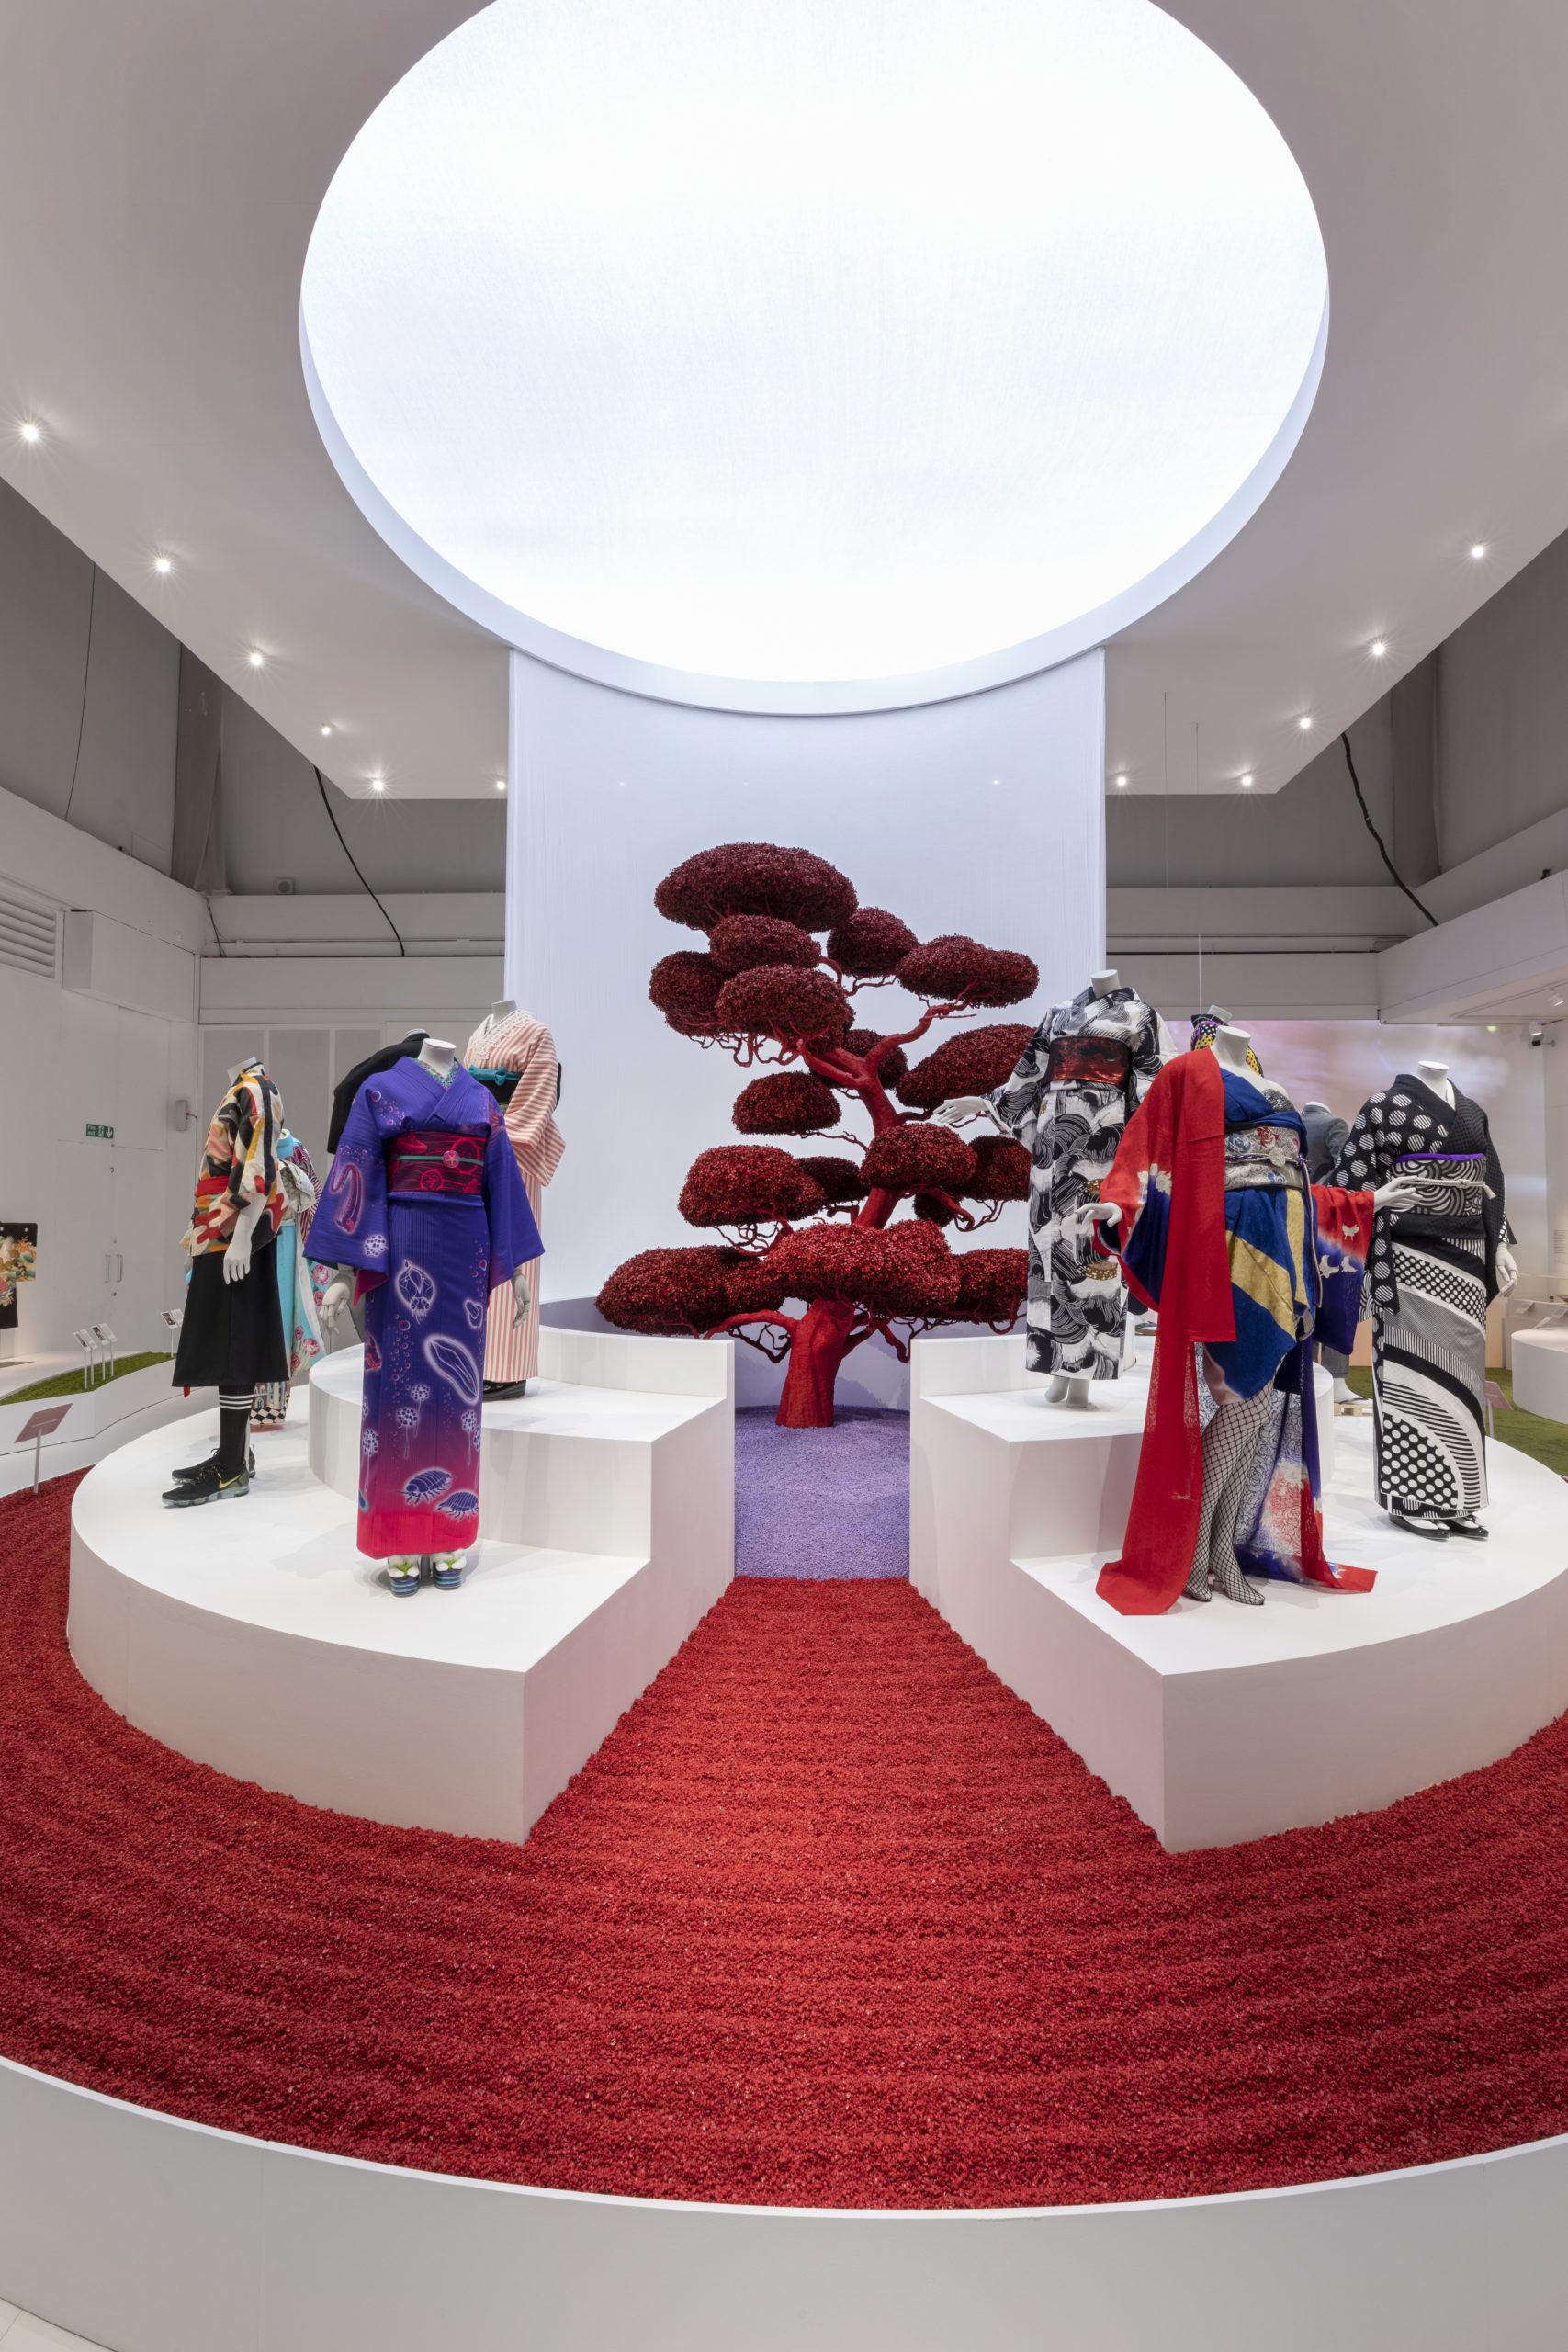 Victoria and Albert Museum / 2020